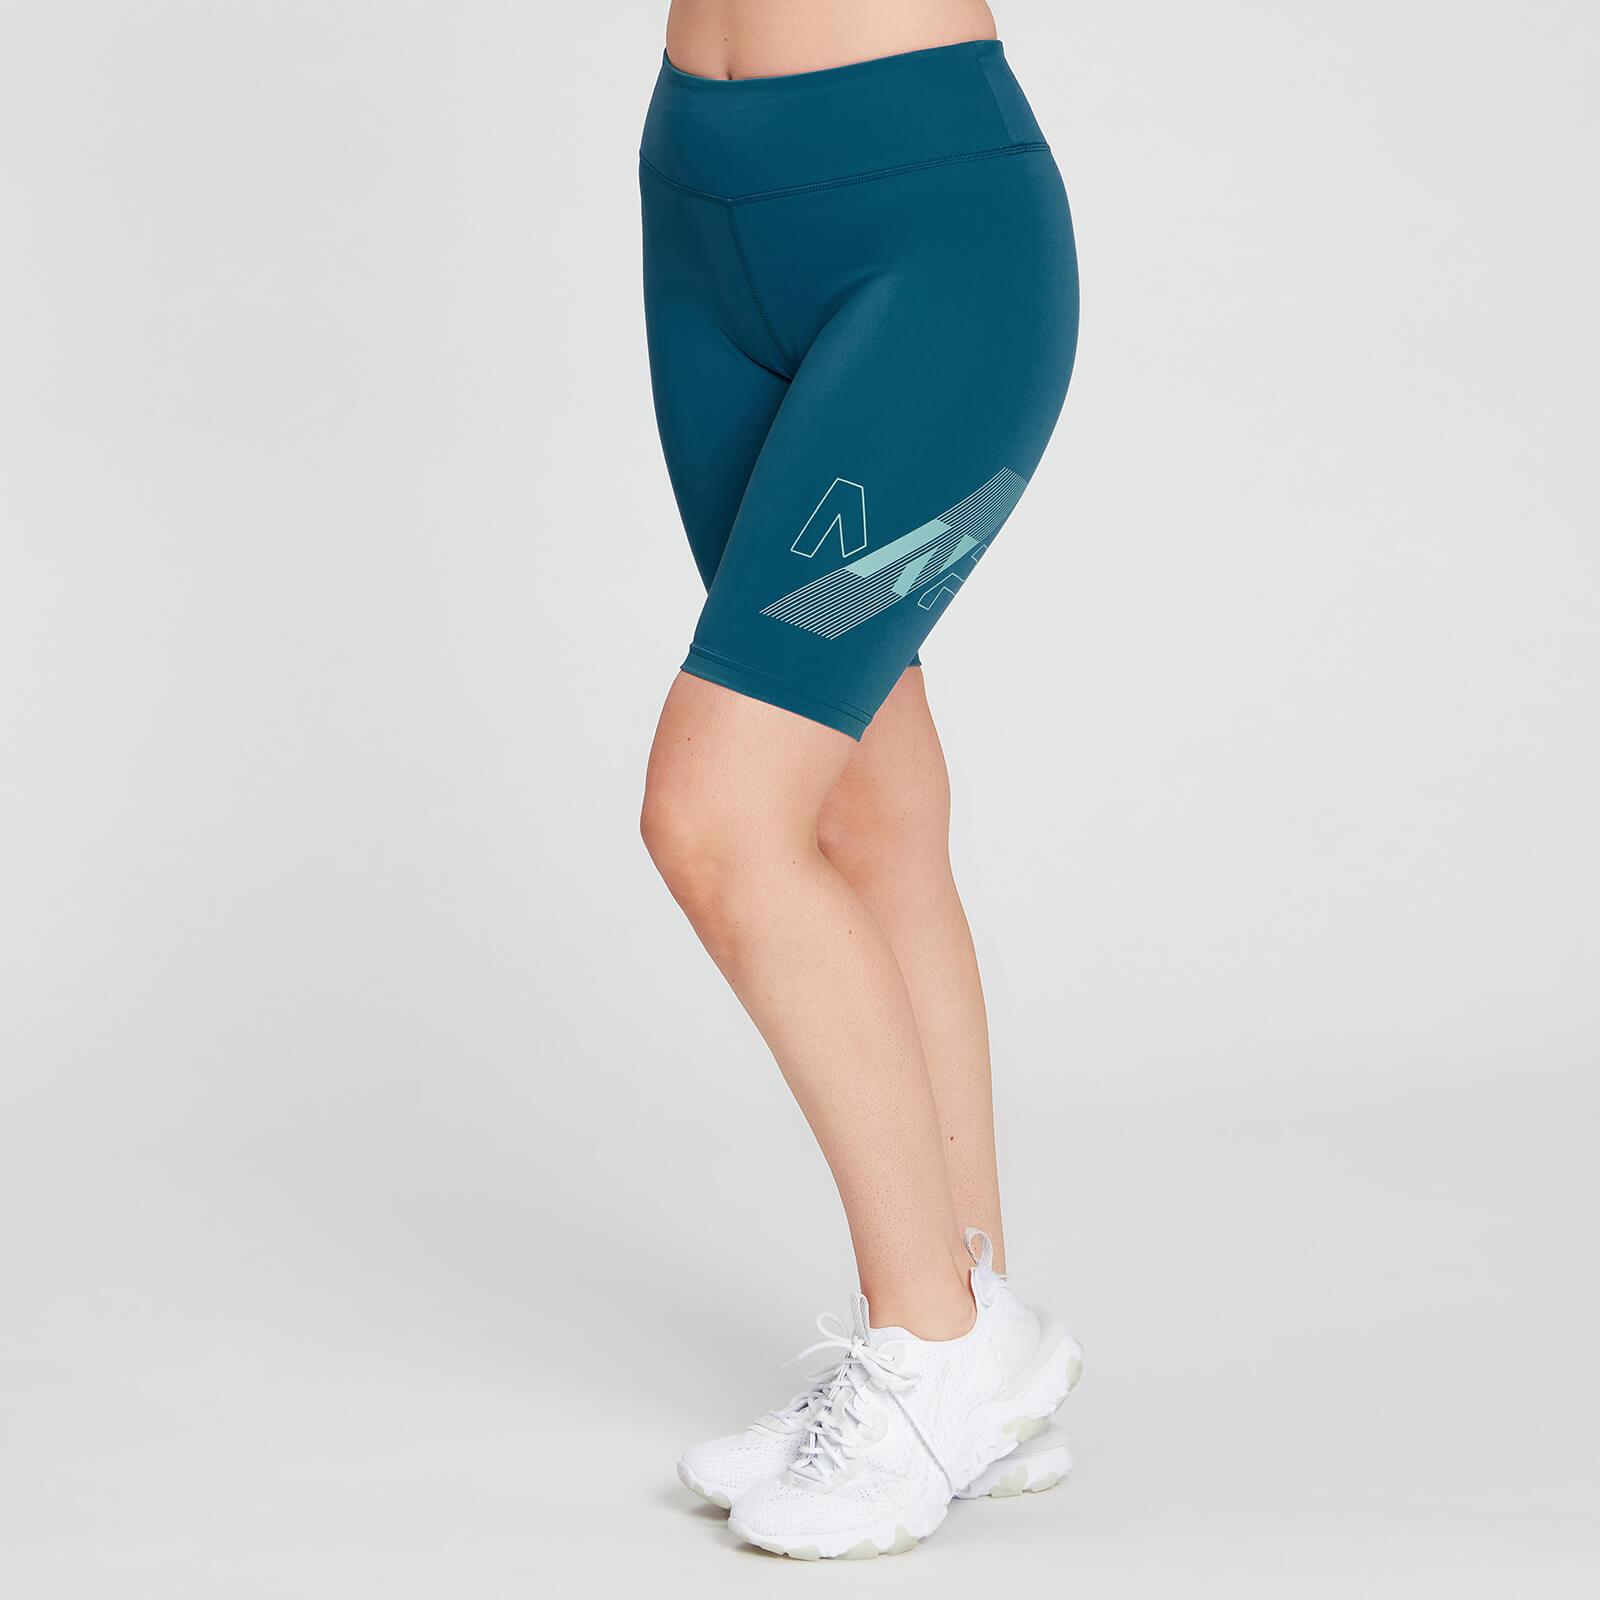 Купить MP Women's Limited Edition Impact Cycling Shorts - Teal - XXL, Myprotein International